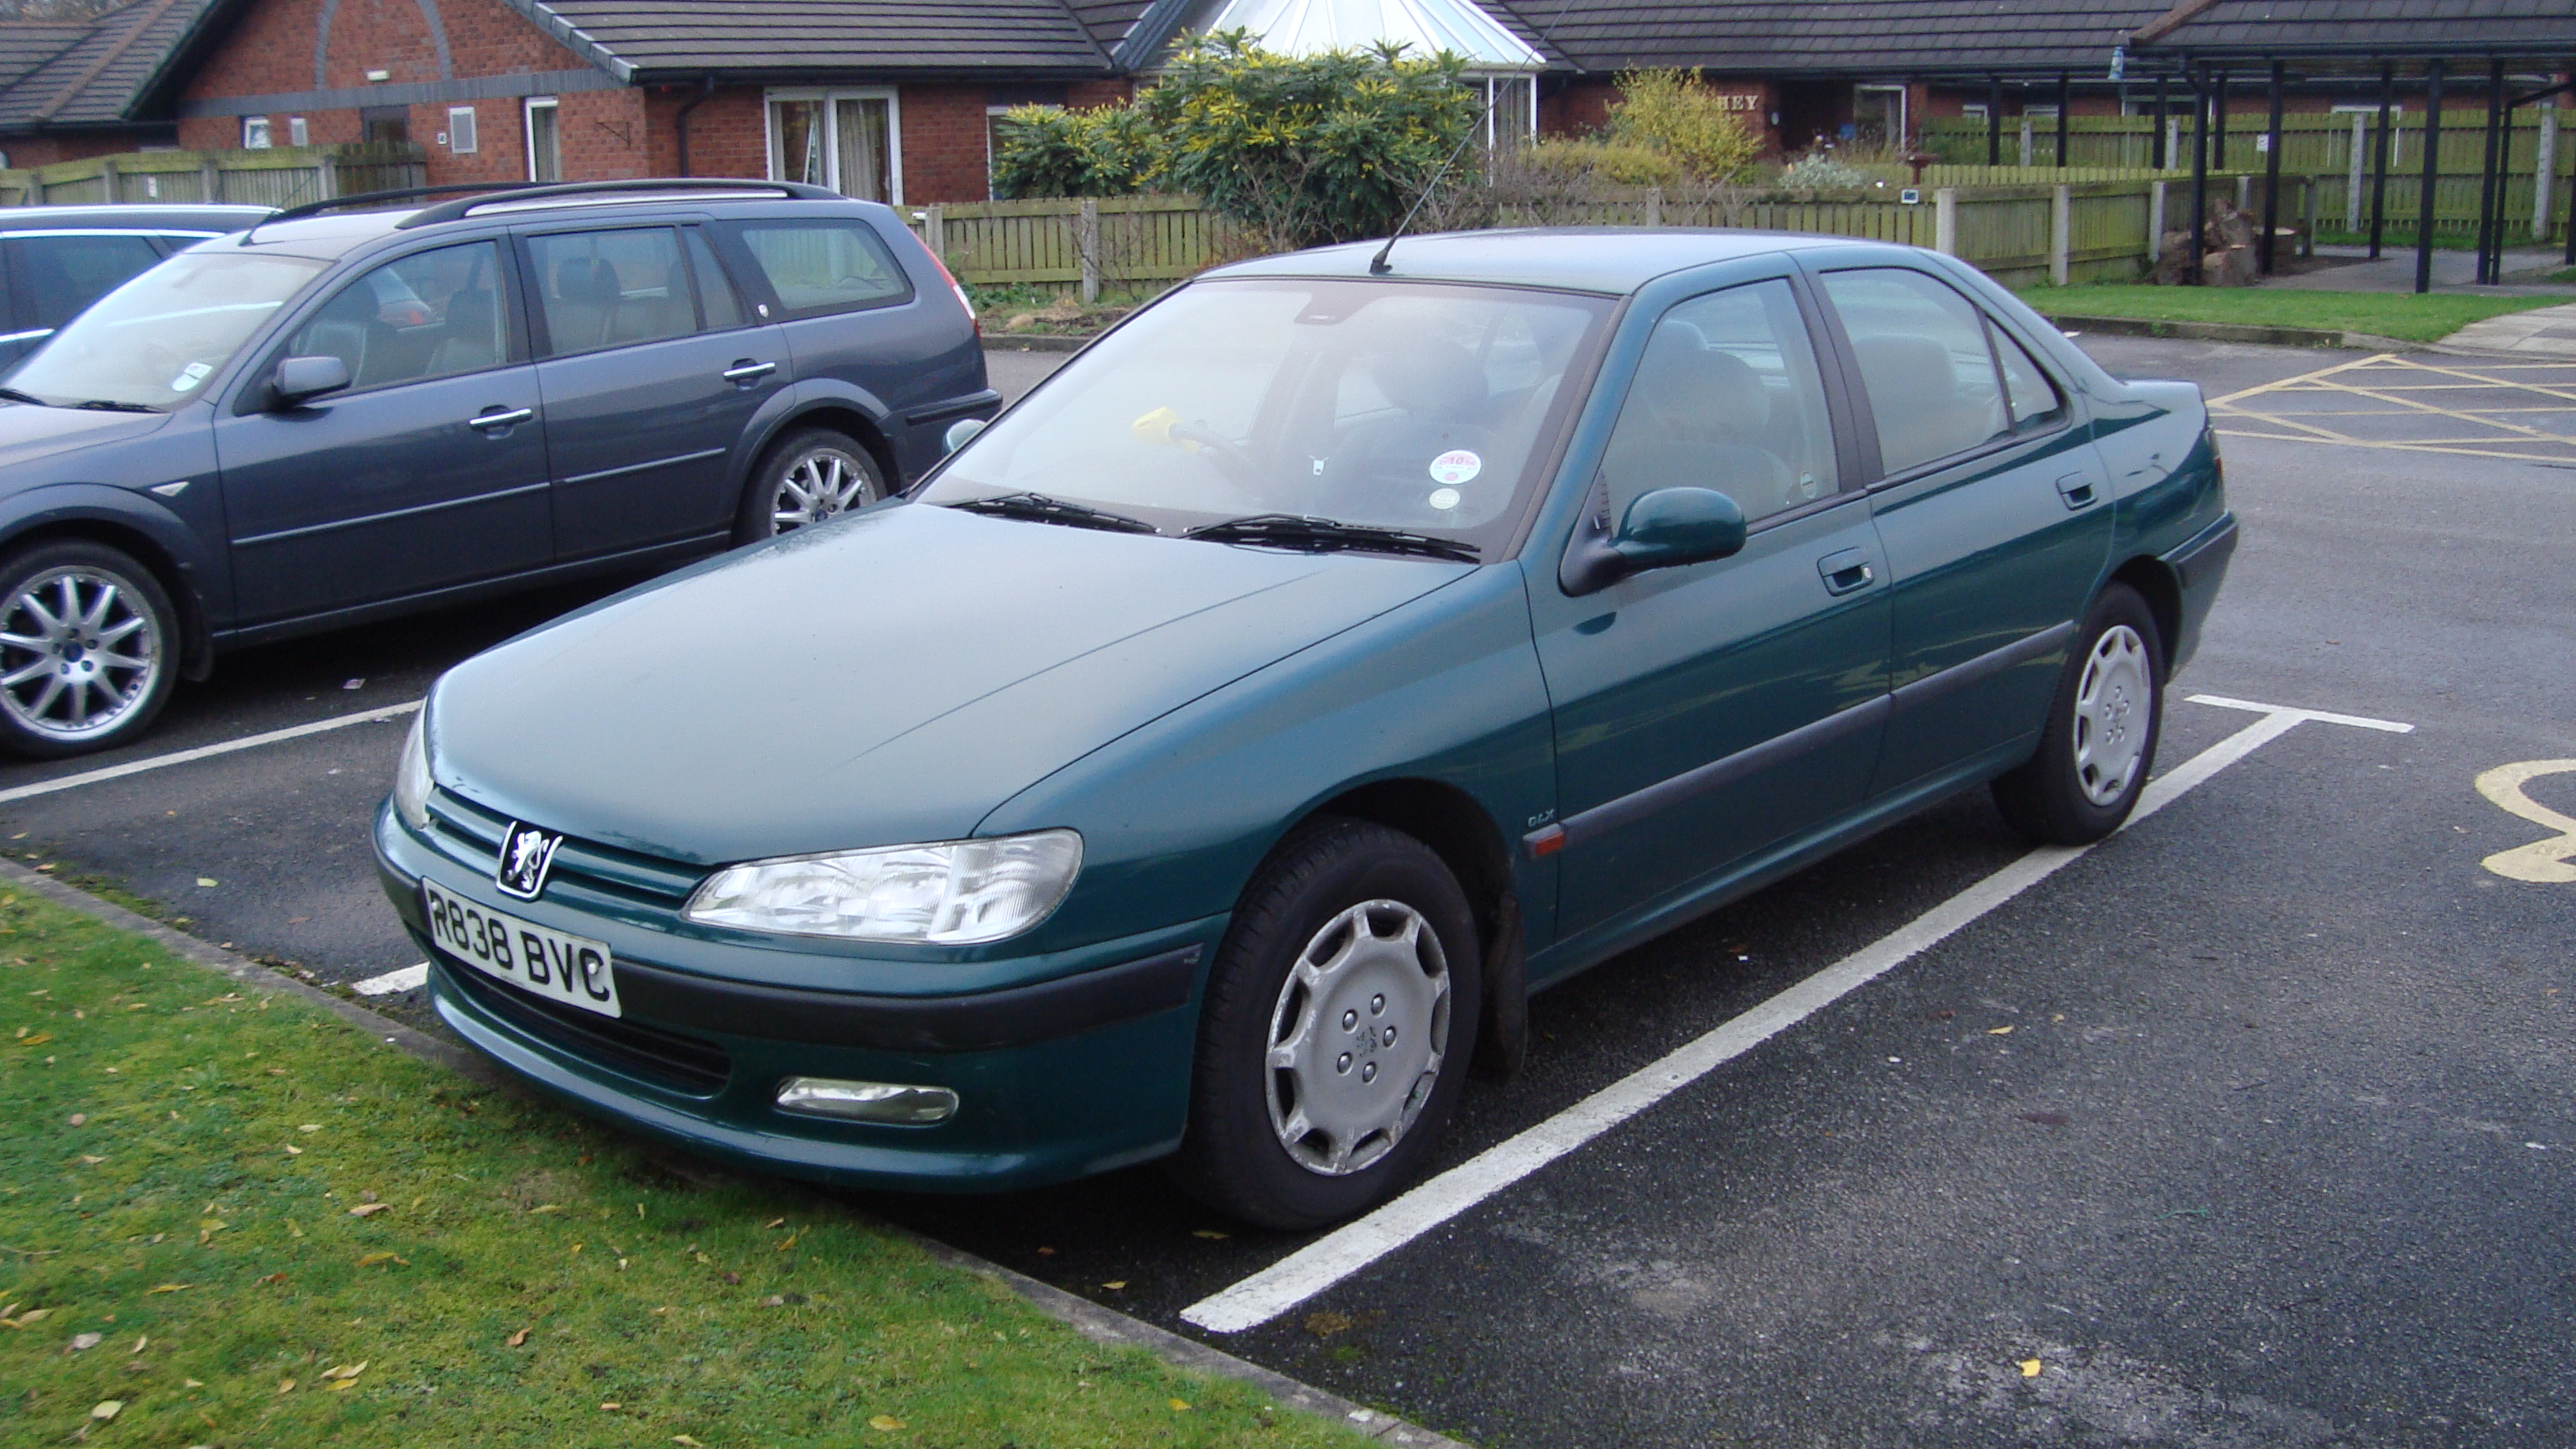 File:1997 Peugeot 406 2.0 GLX (15888982116).jpg